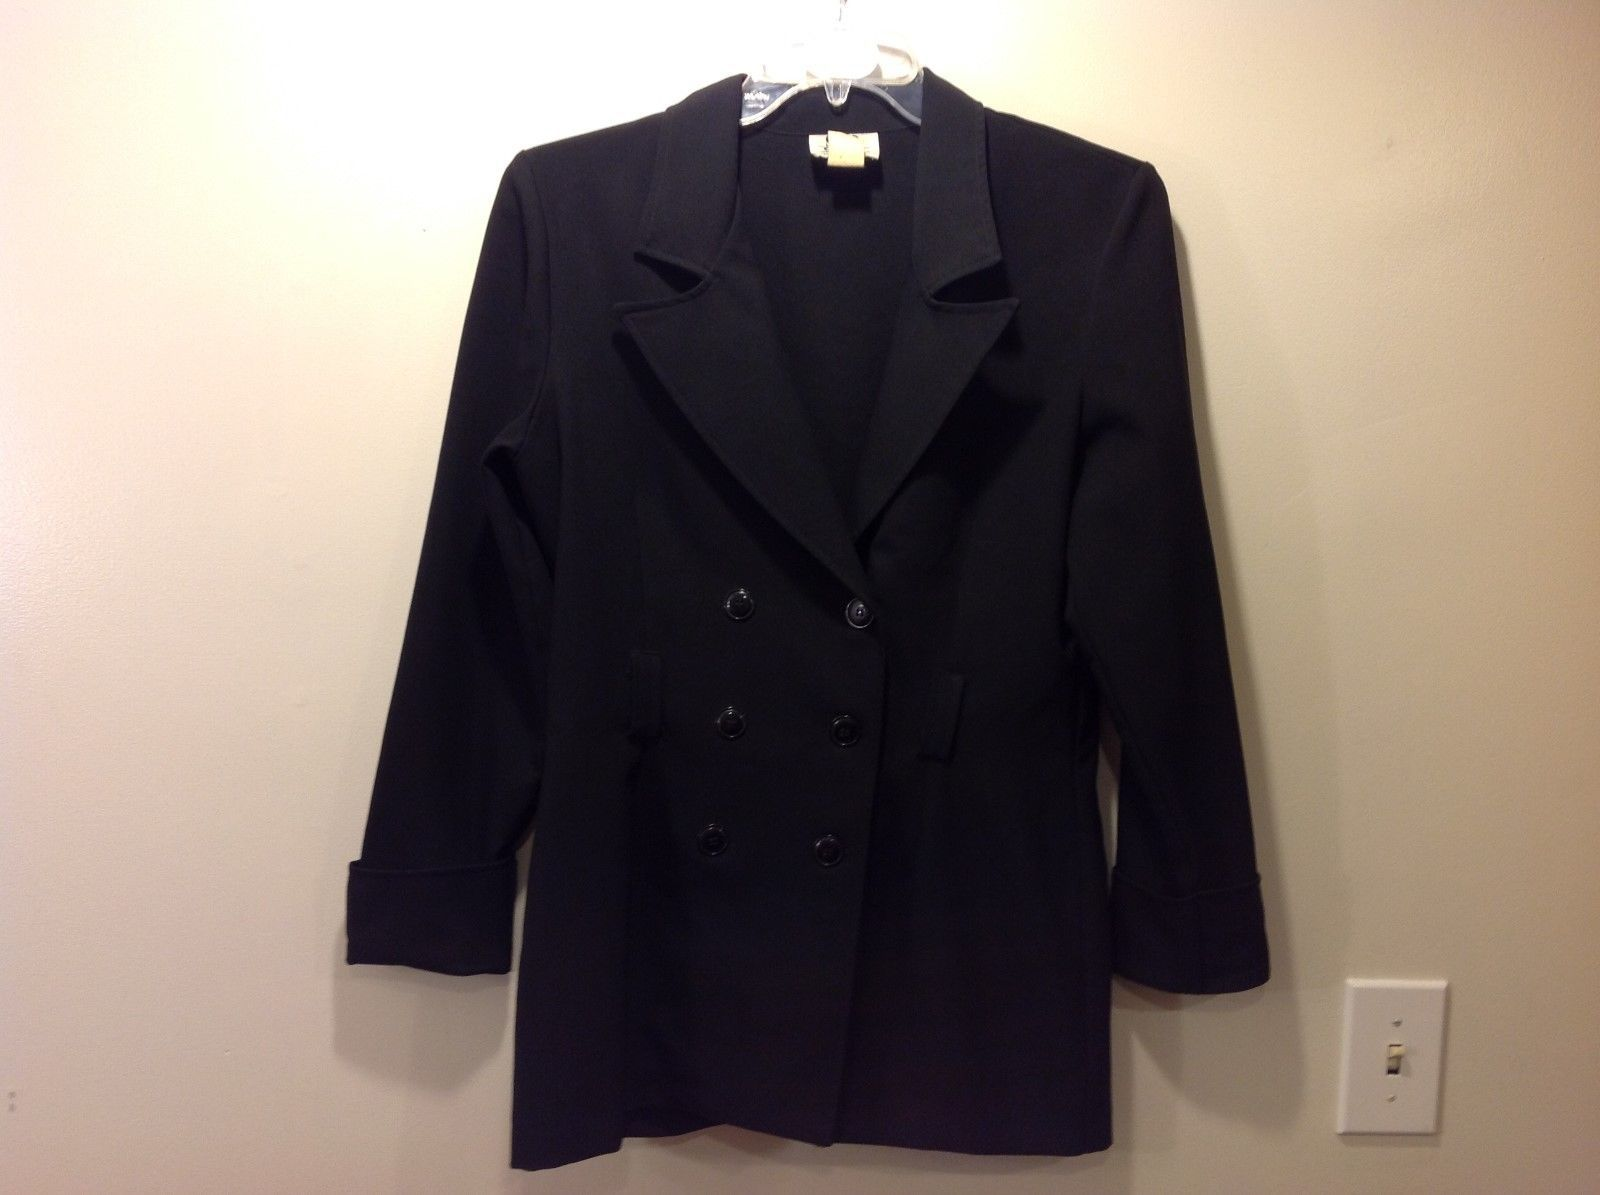 STAR City Clothing Co Simple Black Jacket Size Medium